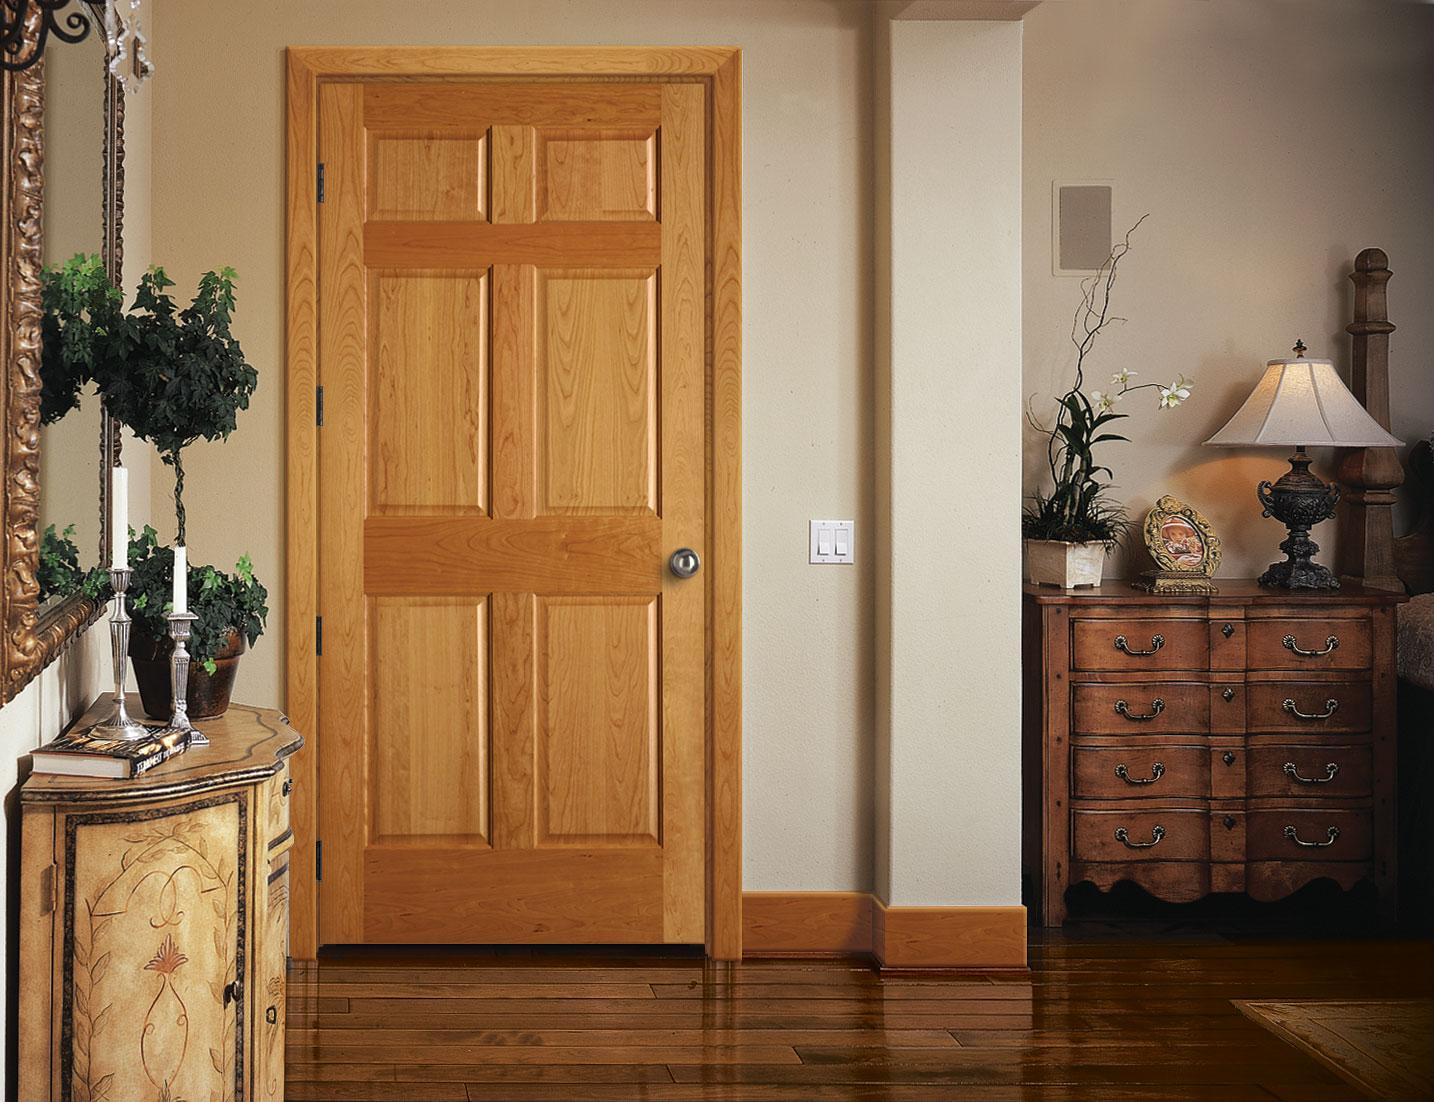 gaišas virtuves stila durvis